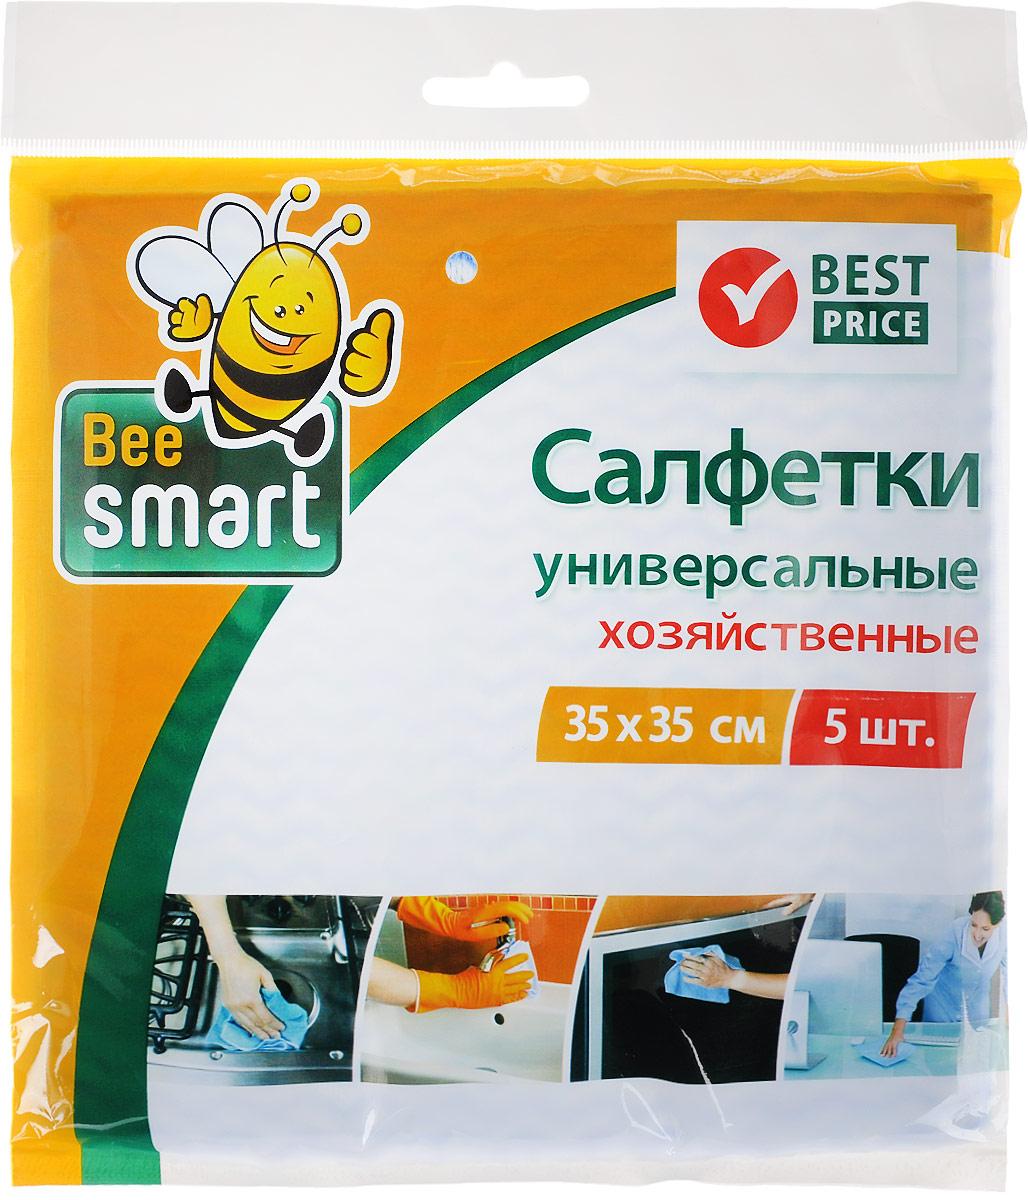 Набор универсальных салфеток Beesmart, 35 х 35 см, 5 шт набор форм для желе и заливного едим дома 12 5 х 1 5 см 5 шт